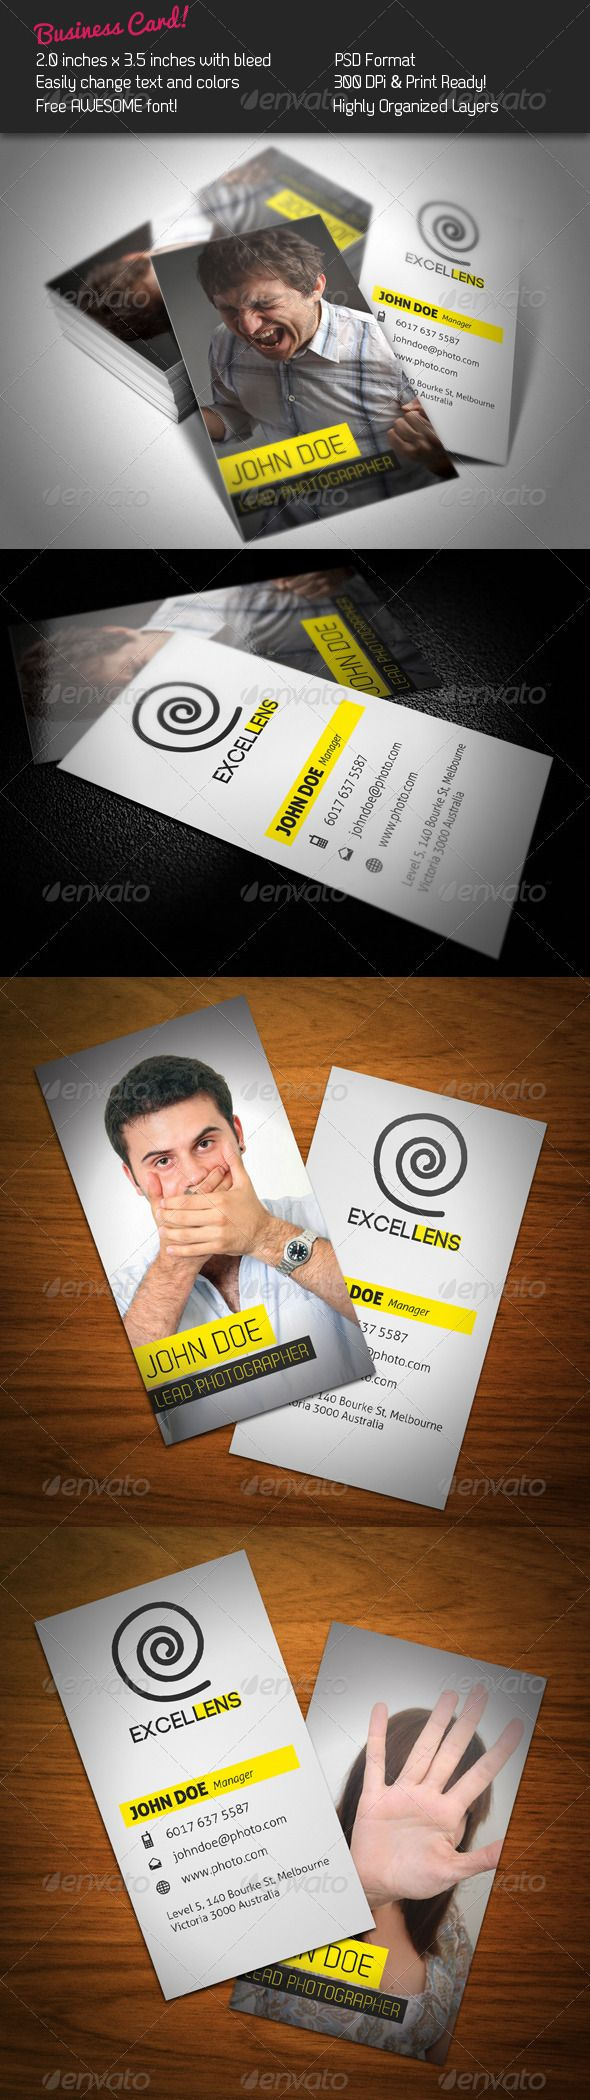 Eccellenti biglietti da visita premium http://www.bce-online.com